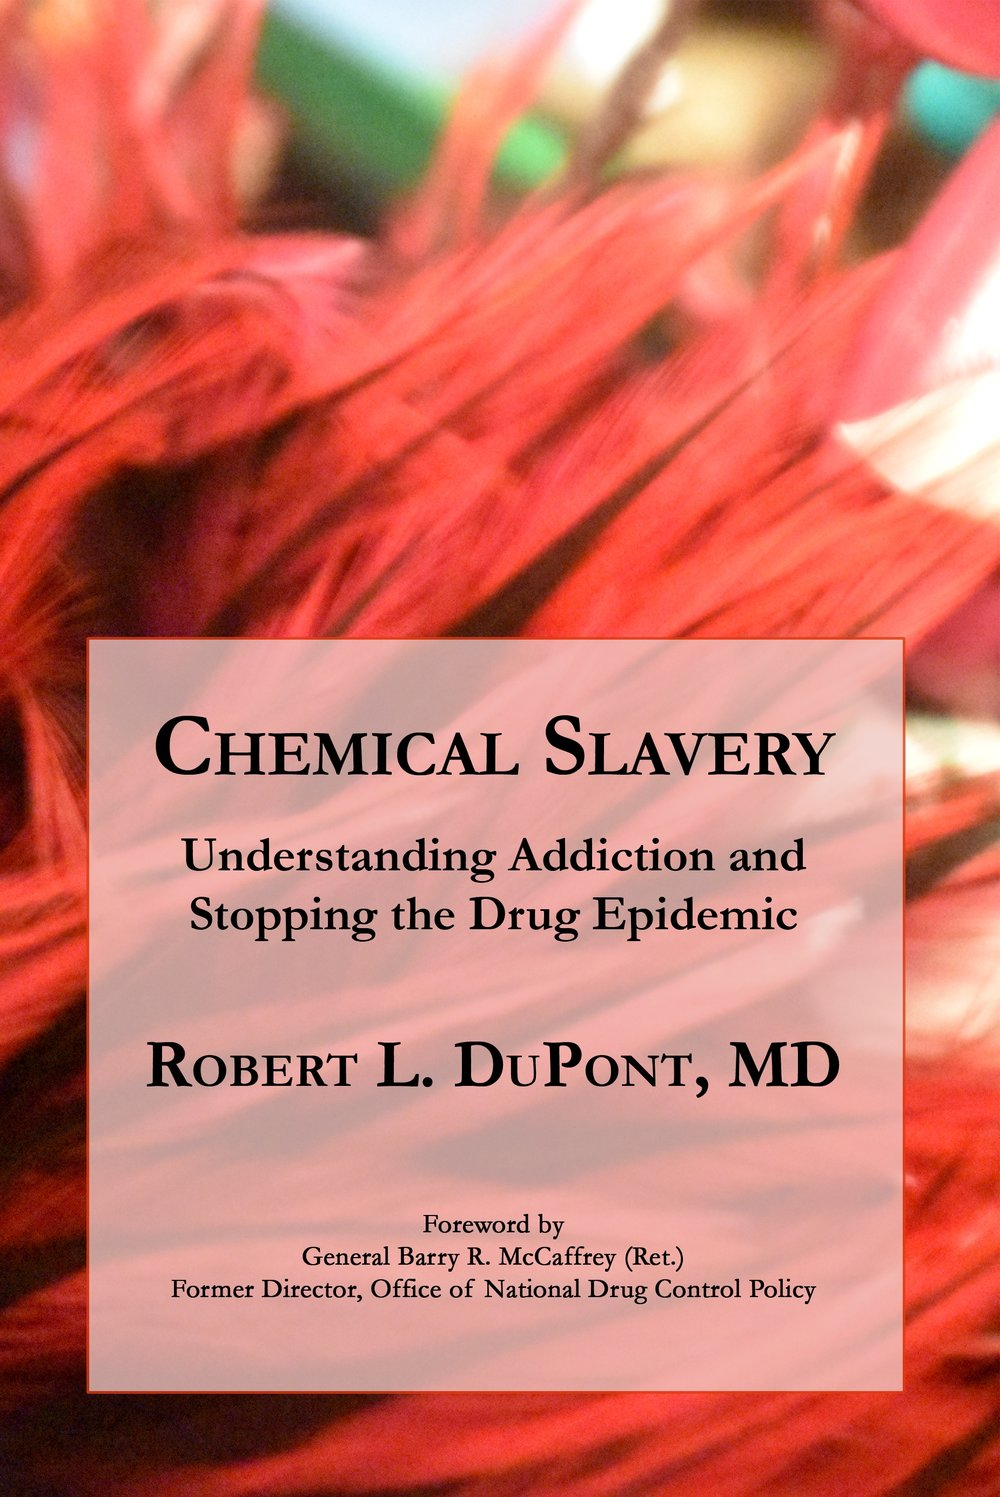 Chemical_Slavery_Book_Cover.jpg